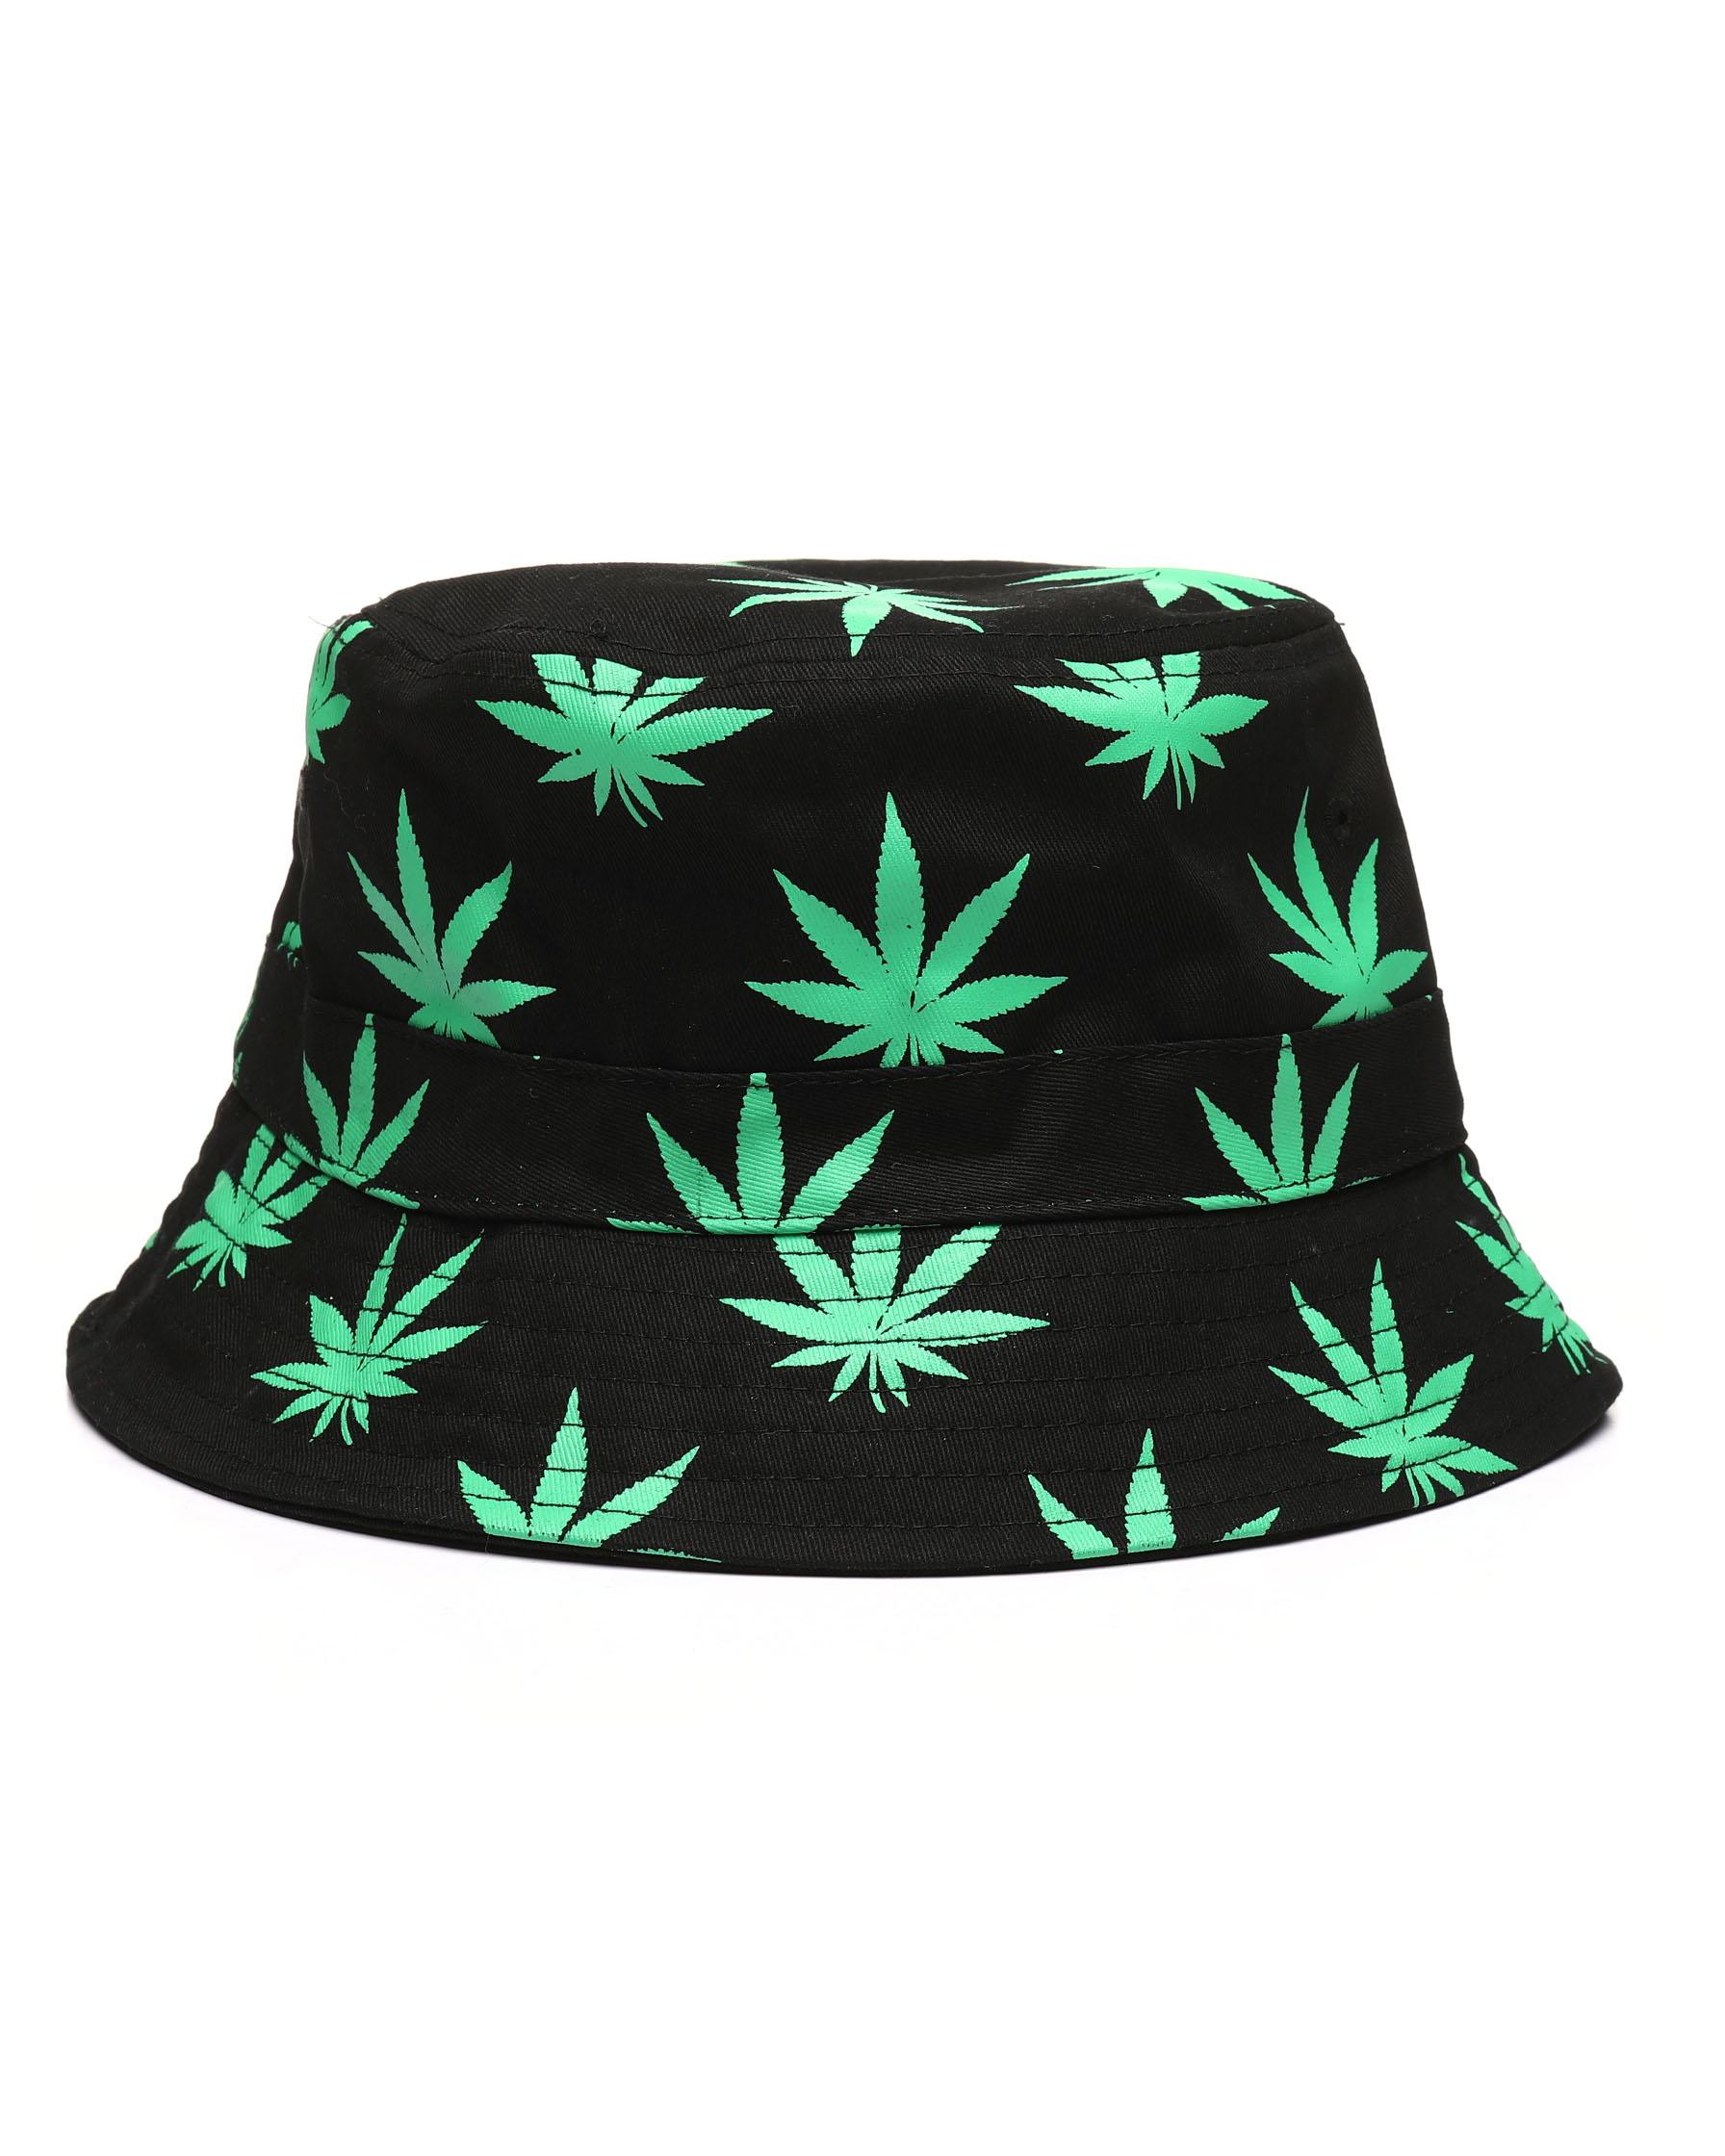 805bfa922 Buy Weed Bucket Hat Men's Hats from Buyers Picks. Find Buyers Picks ...